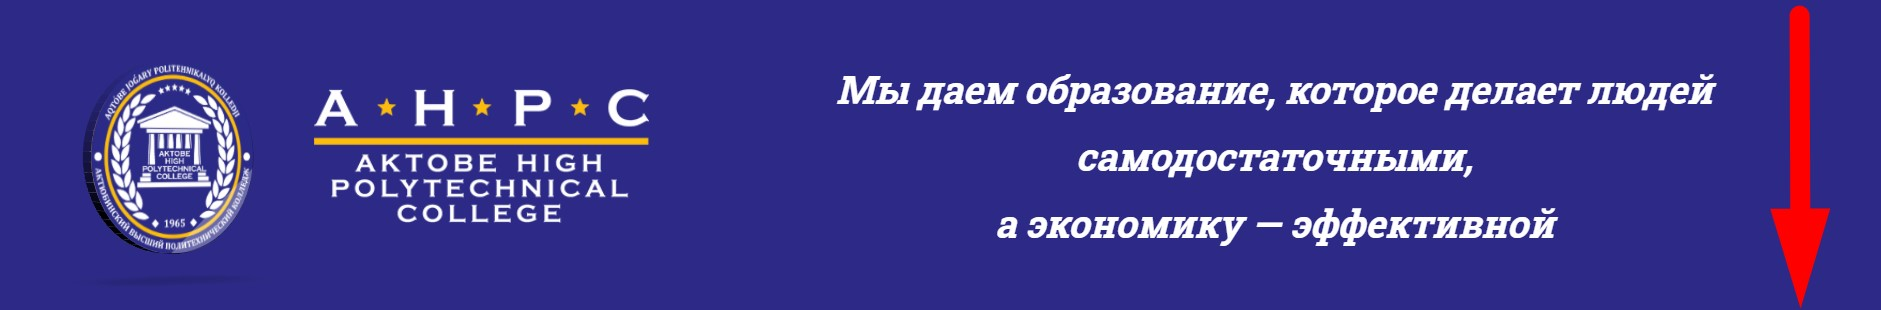 987654345678